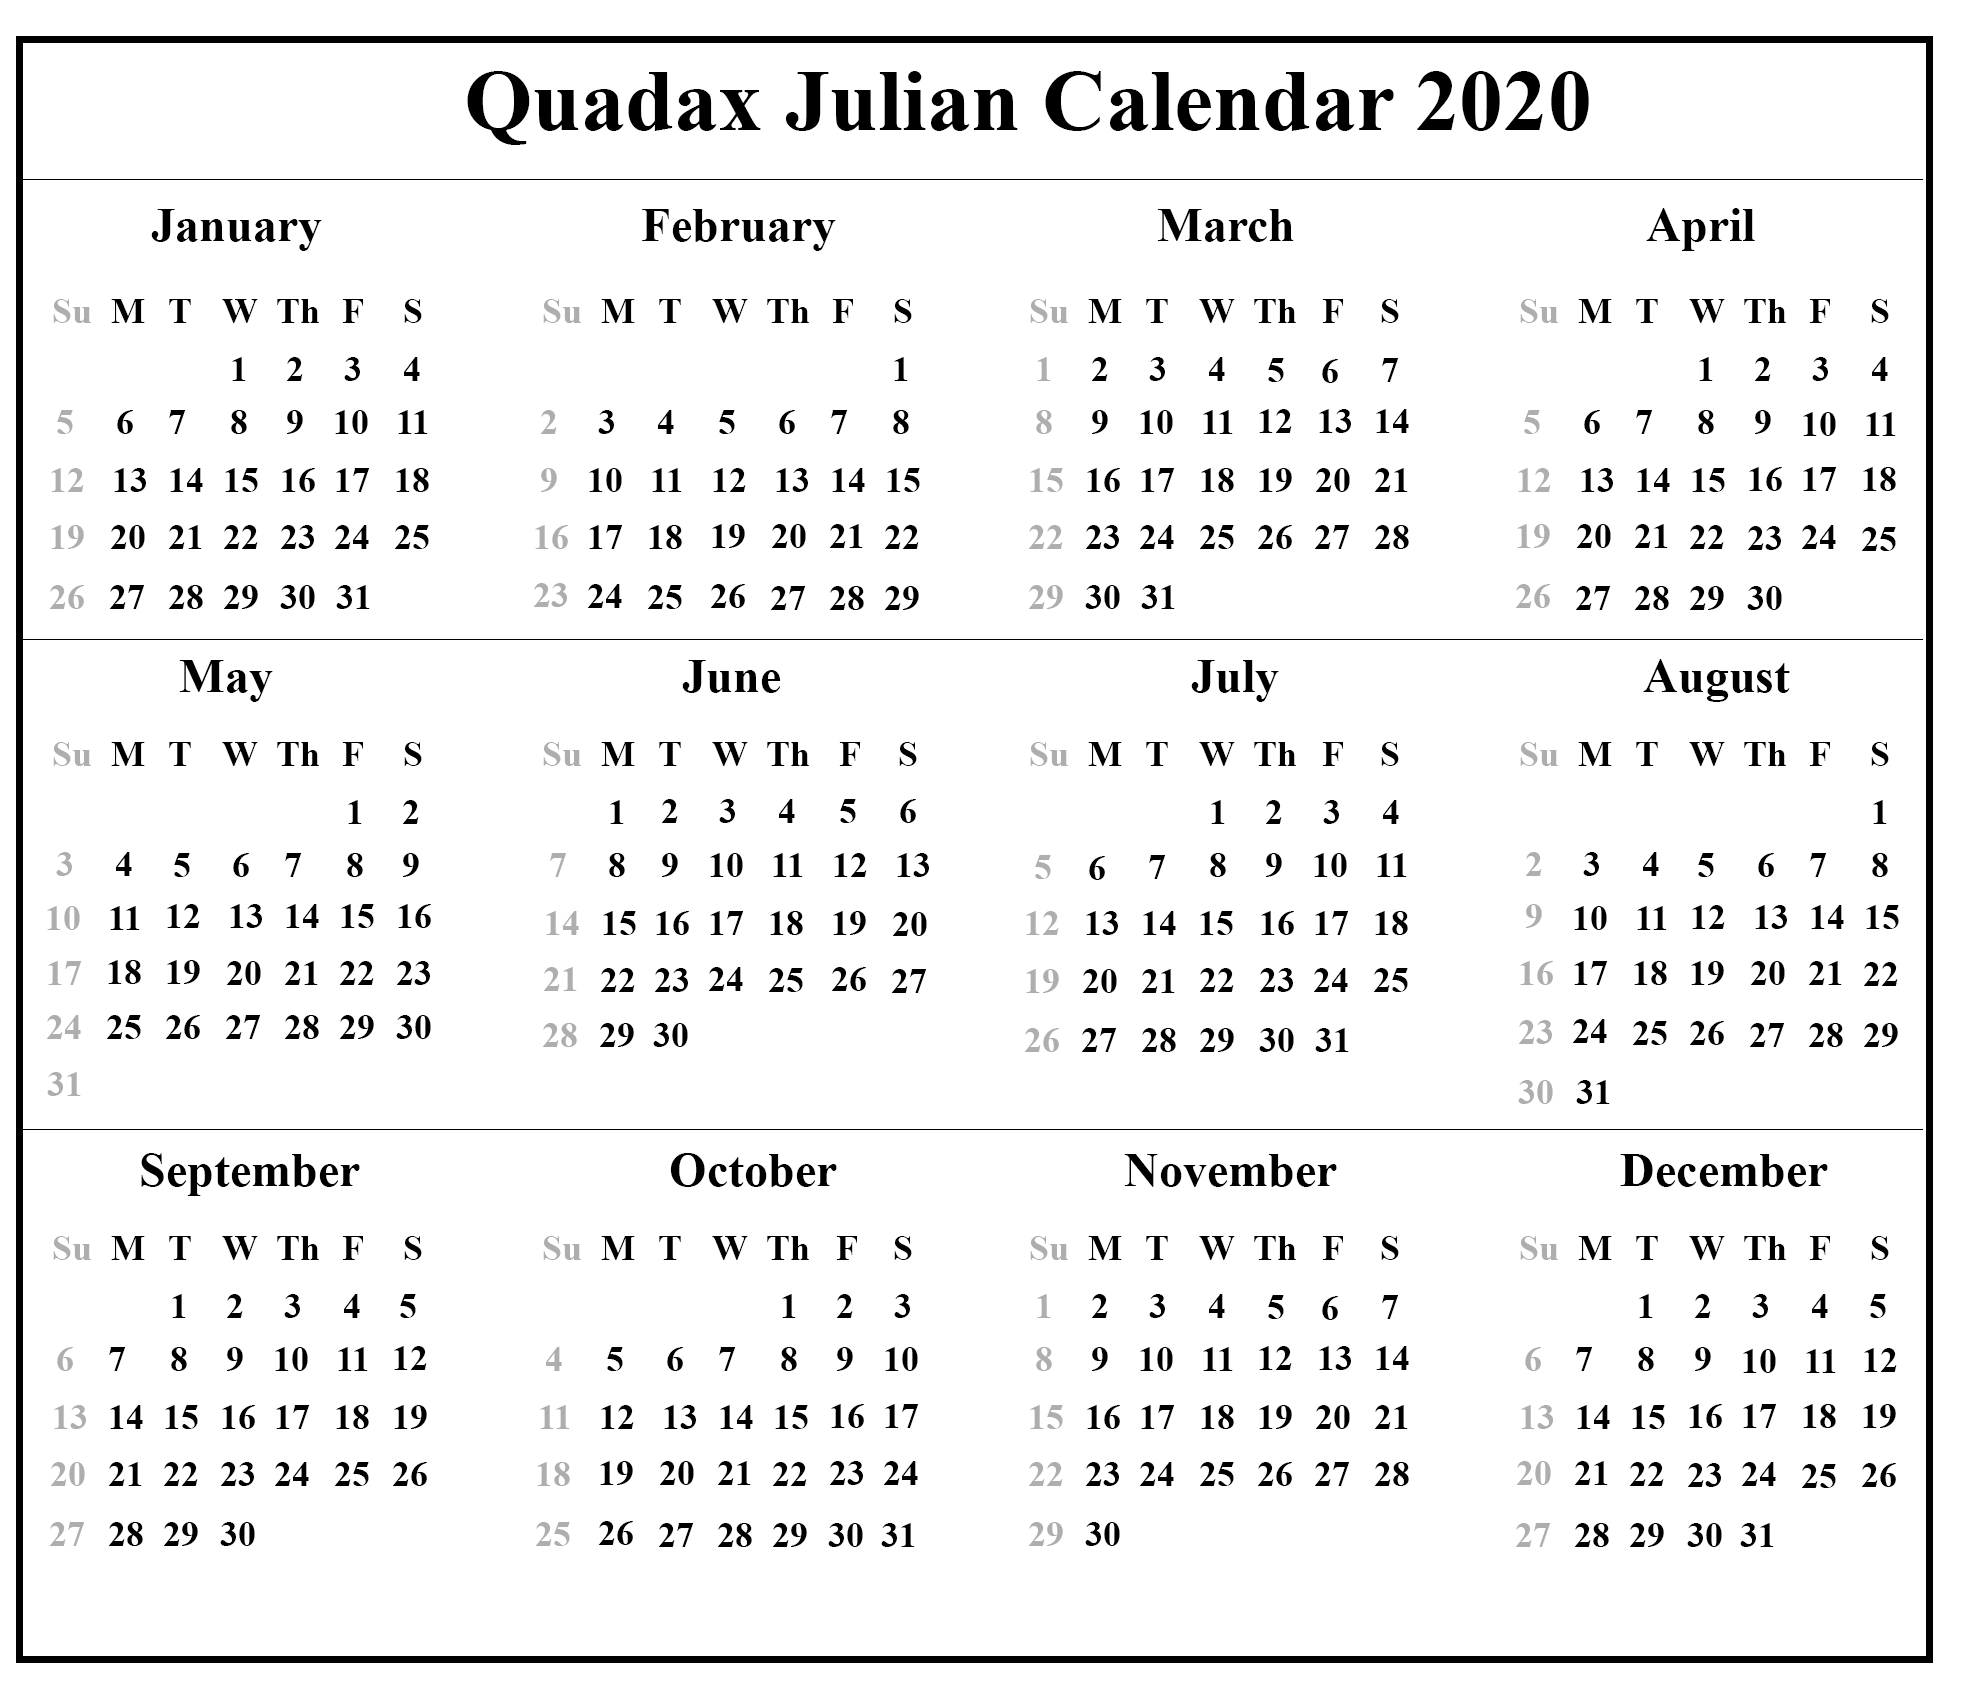 Quadax-Julian-Calendar-2020 | Printable Calendar Diy